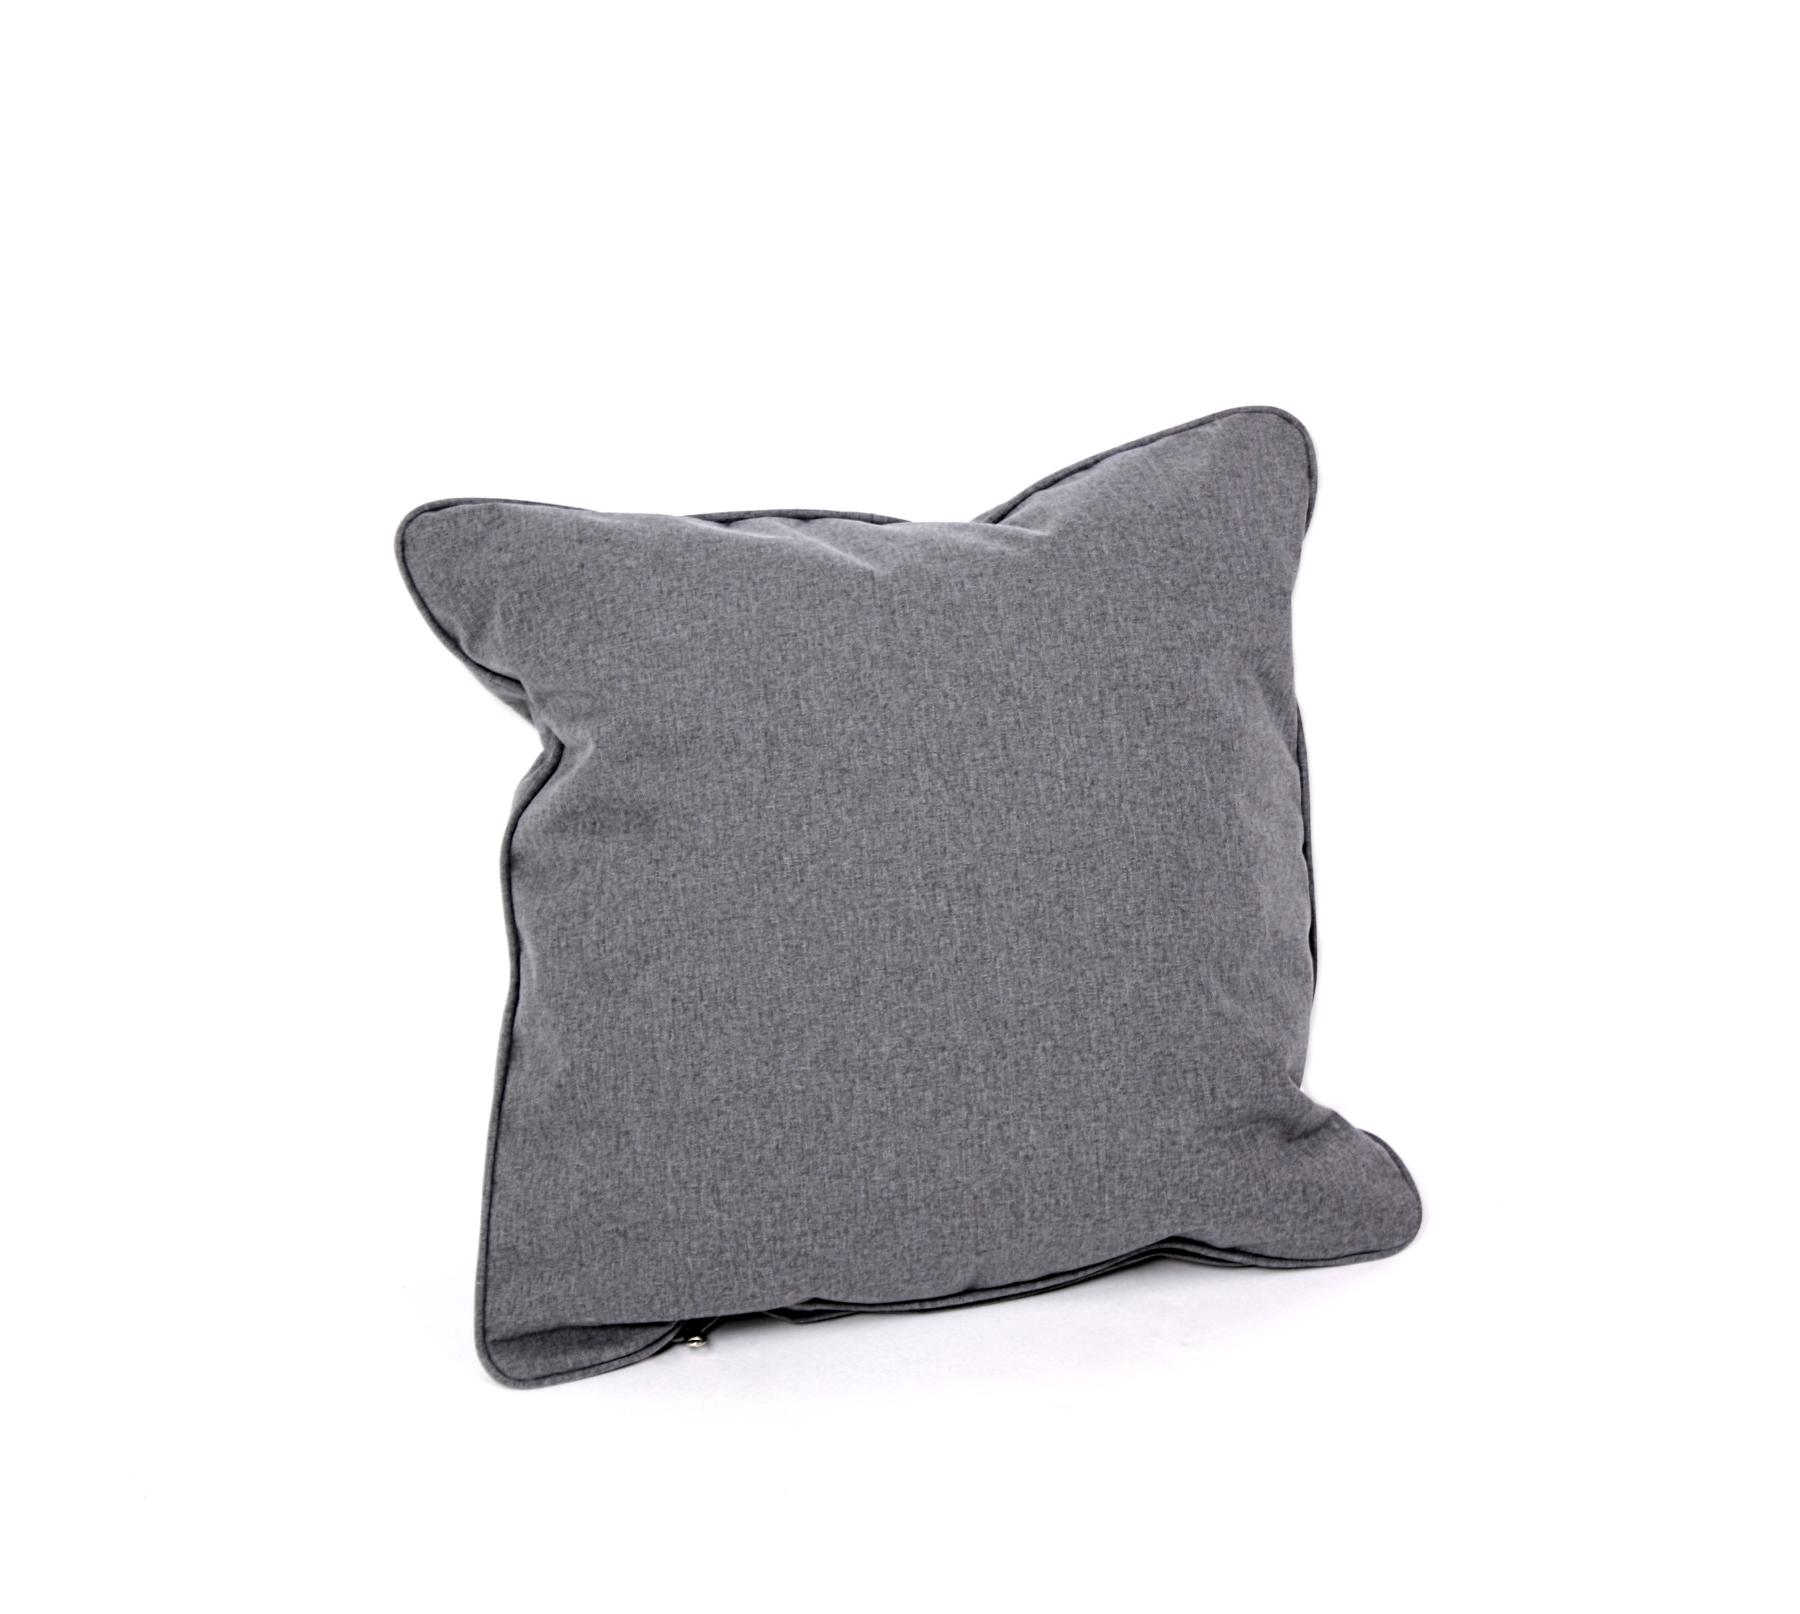 dekokissen orlando 50x50 outdoor dekokissen von supersack. Black Bedroom Furniture Sets. Home Design Ideas